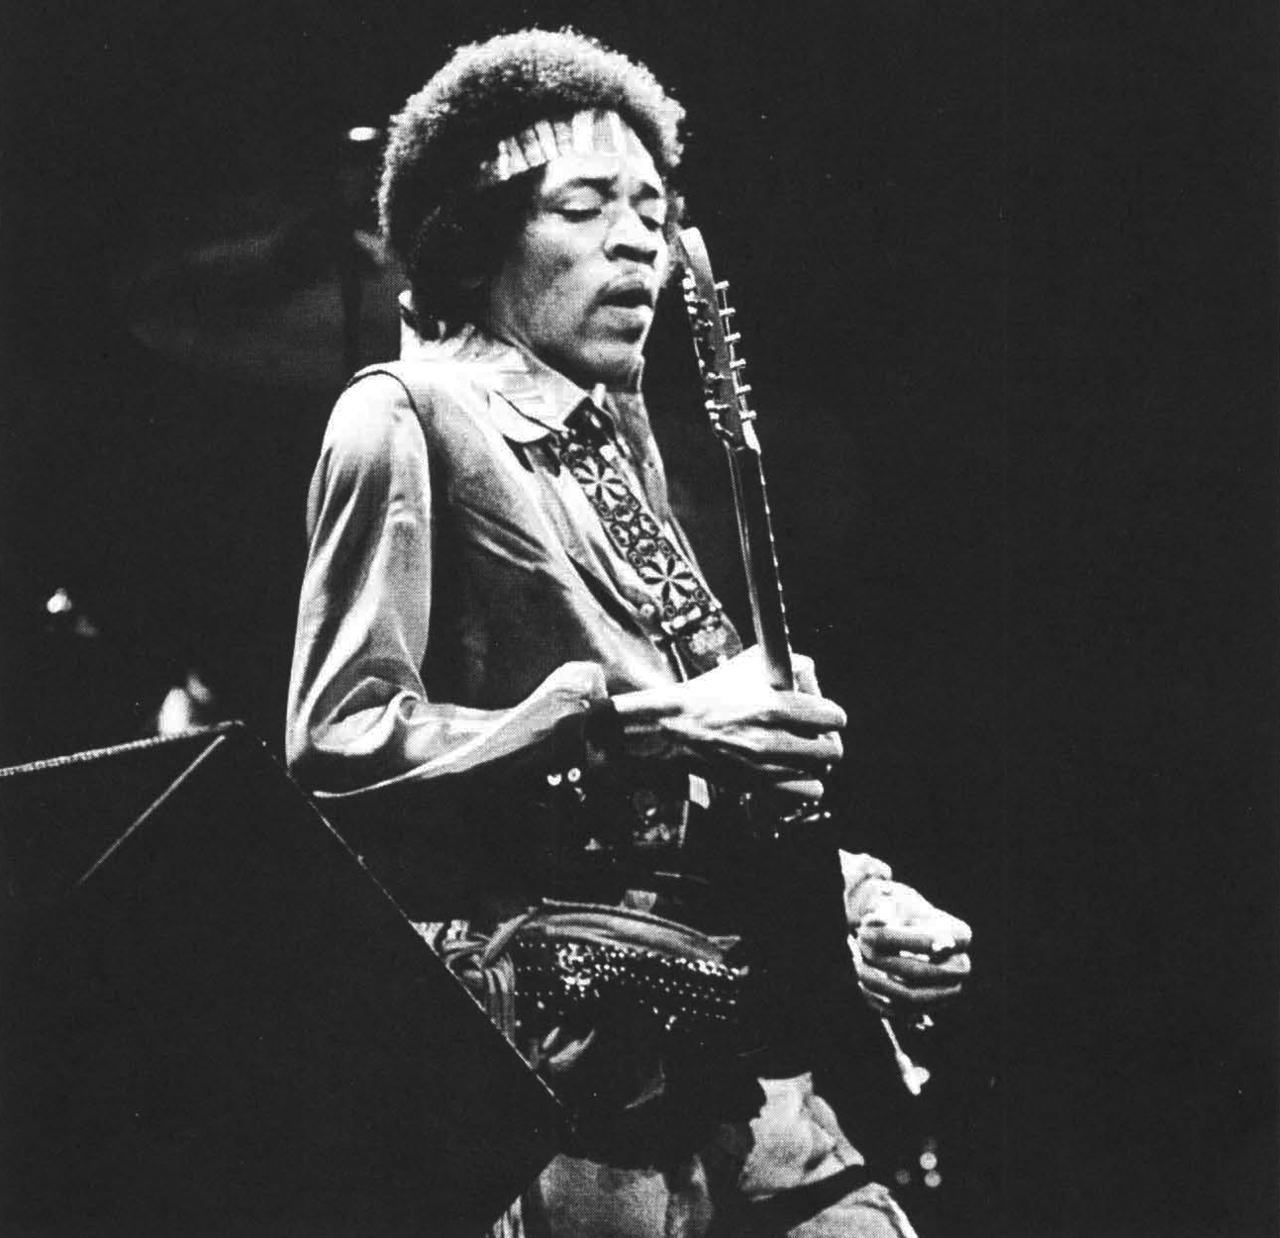 New York (Fillmore East) : 1er janvier 1970 [Premier concert]  A2b76908d186e4768609286f977f7f05